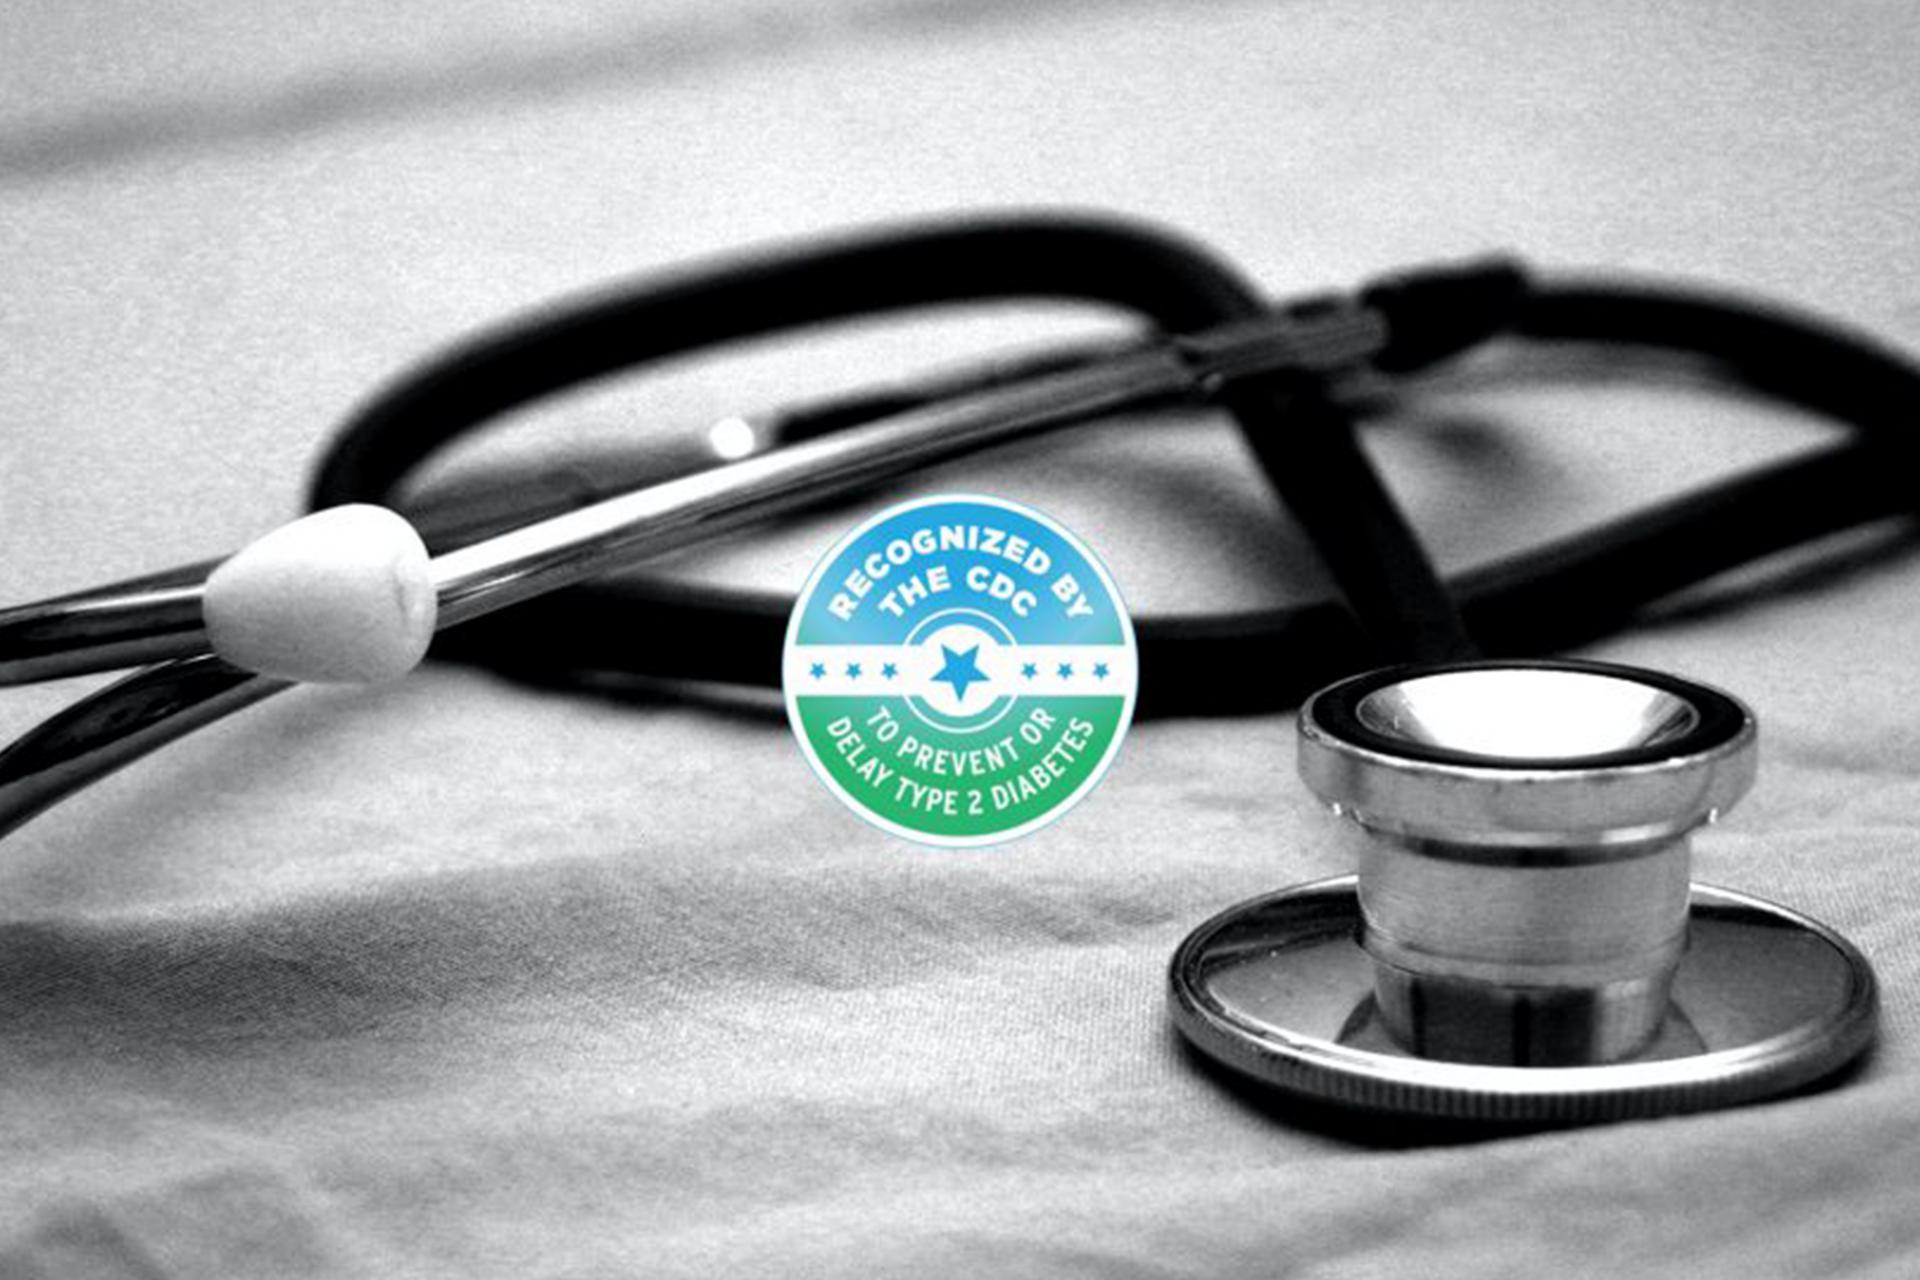 A stethoscope beside the CDC logo